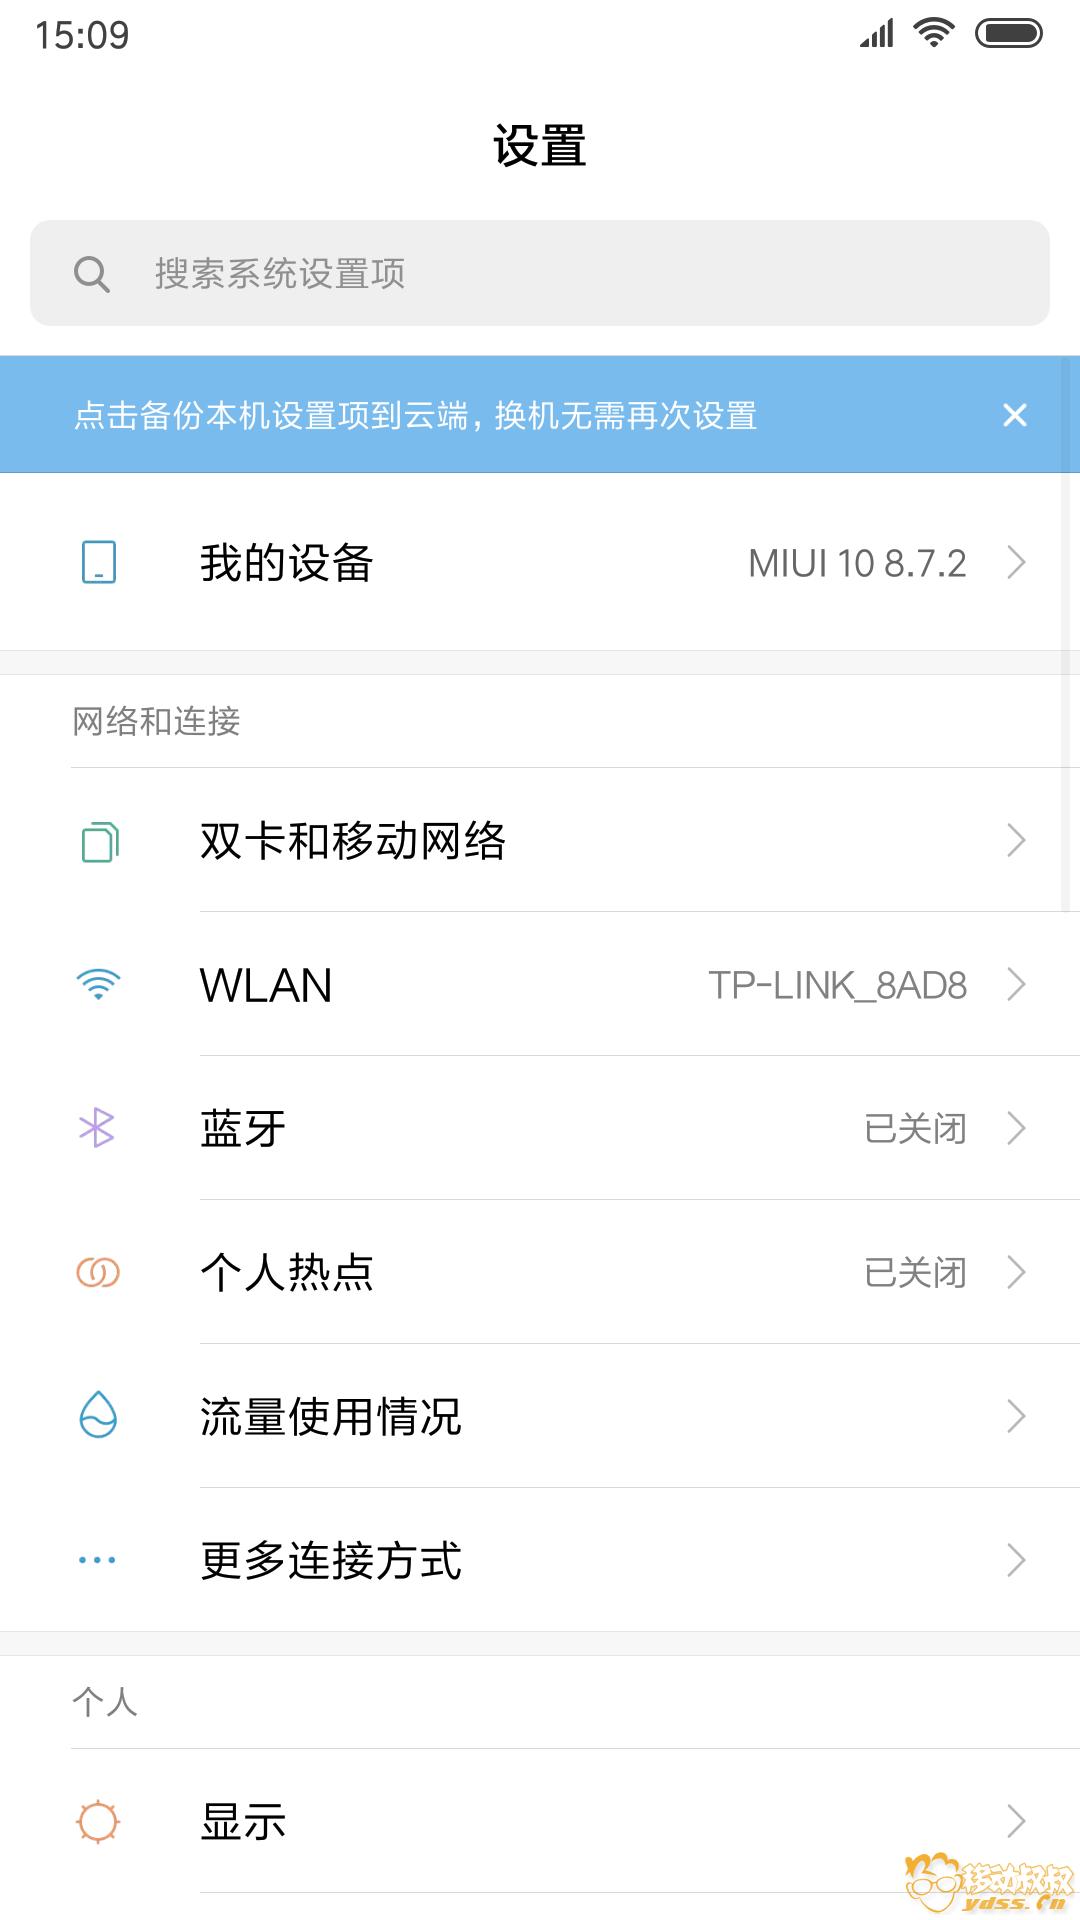 Screenshot_2018-07-03-15-09-59-384_com.android.settings.png